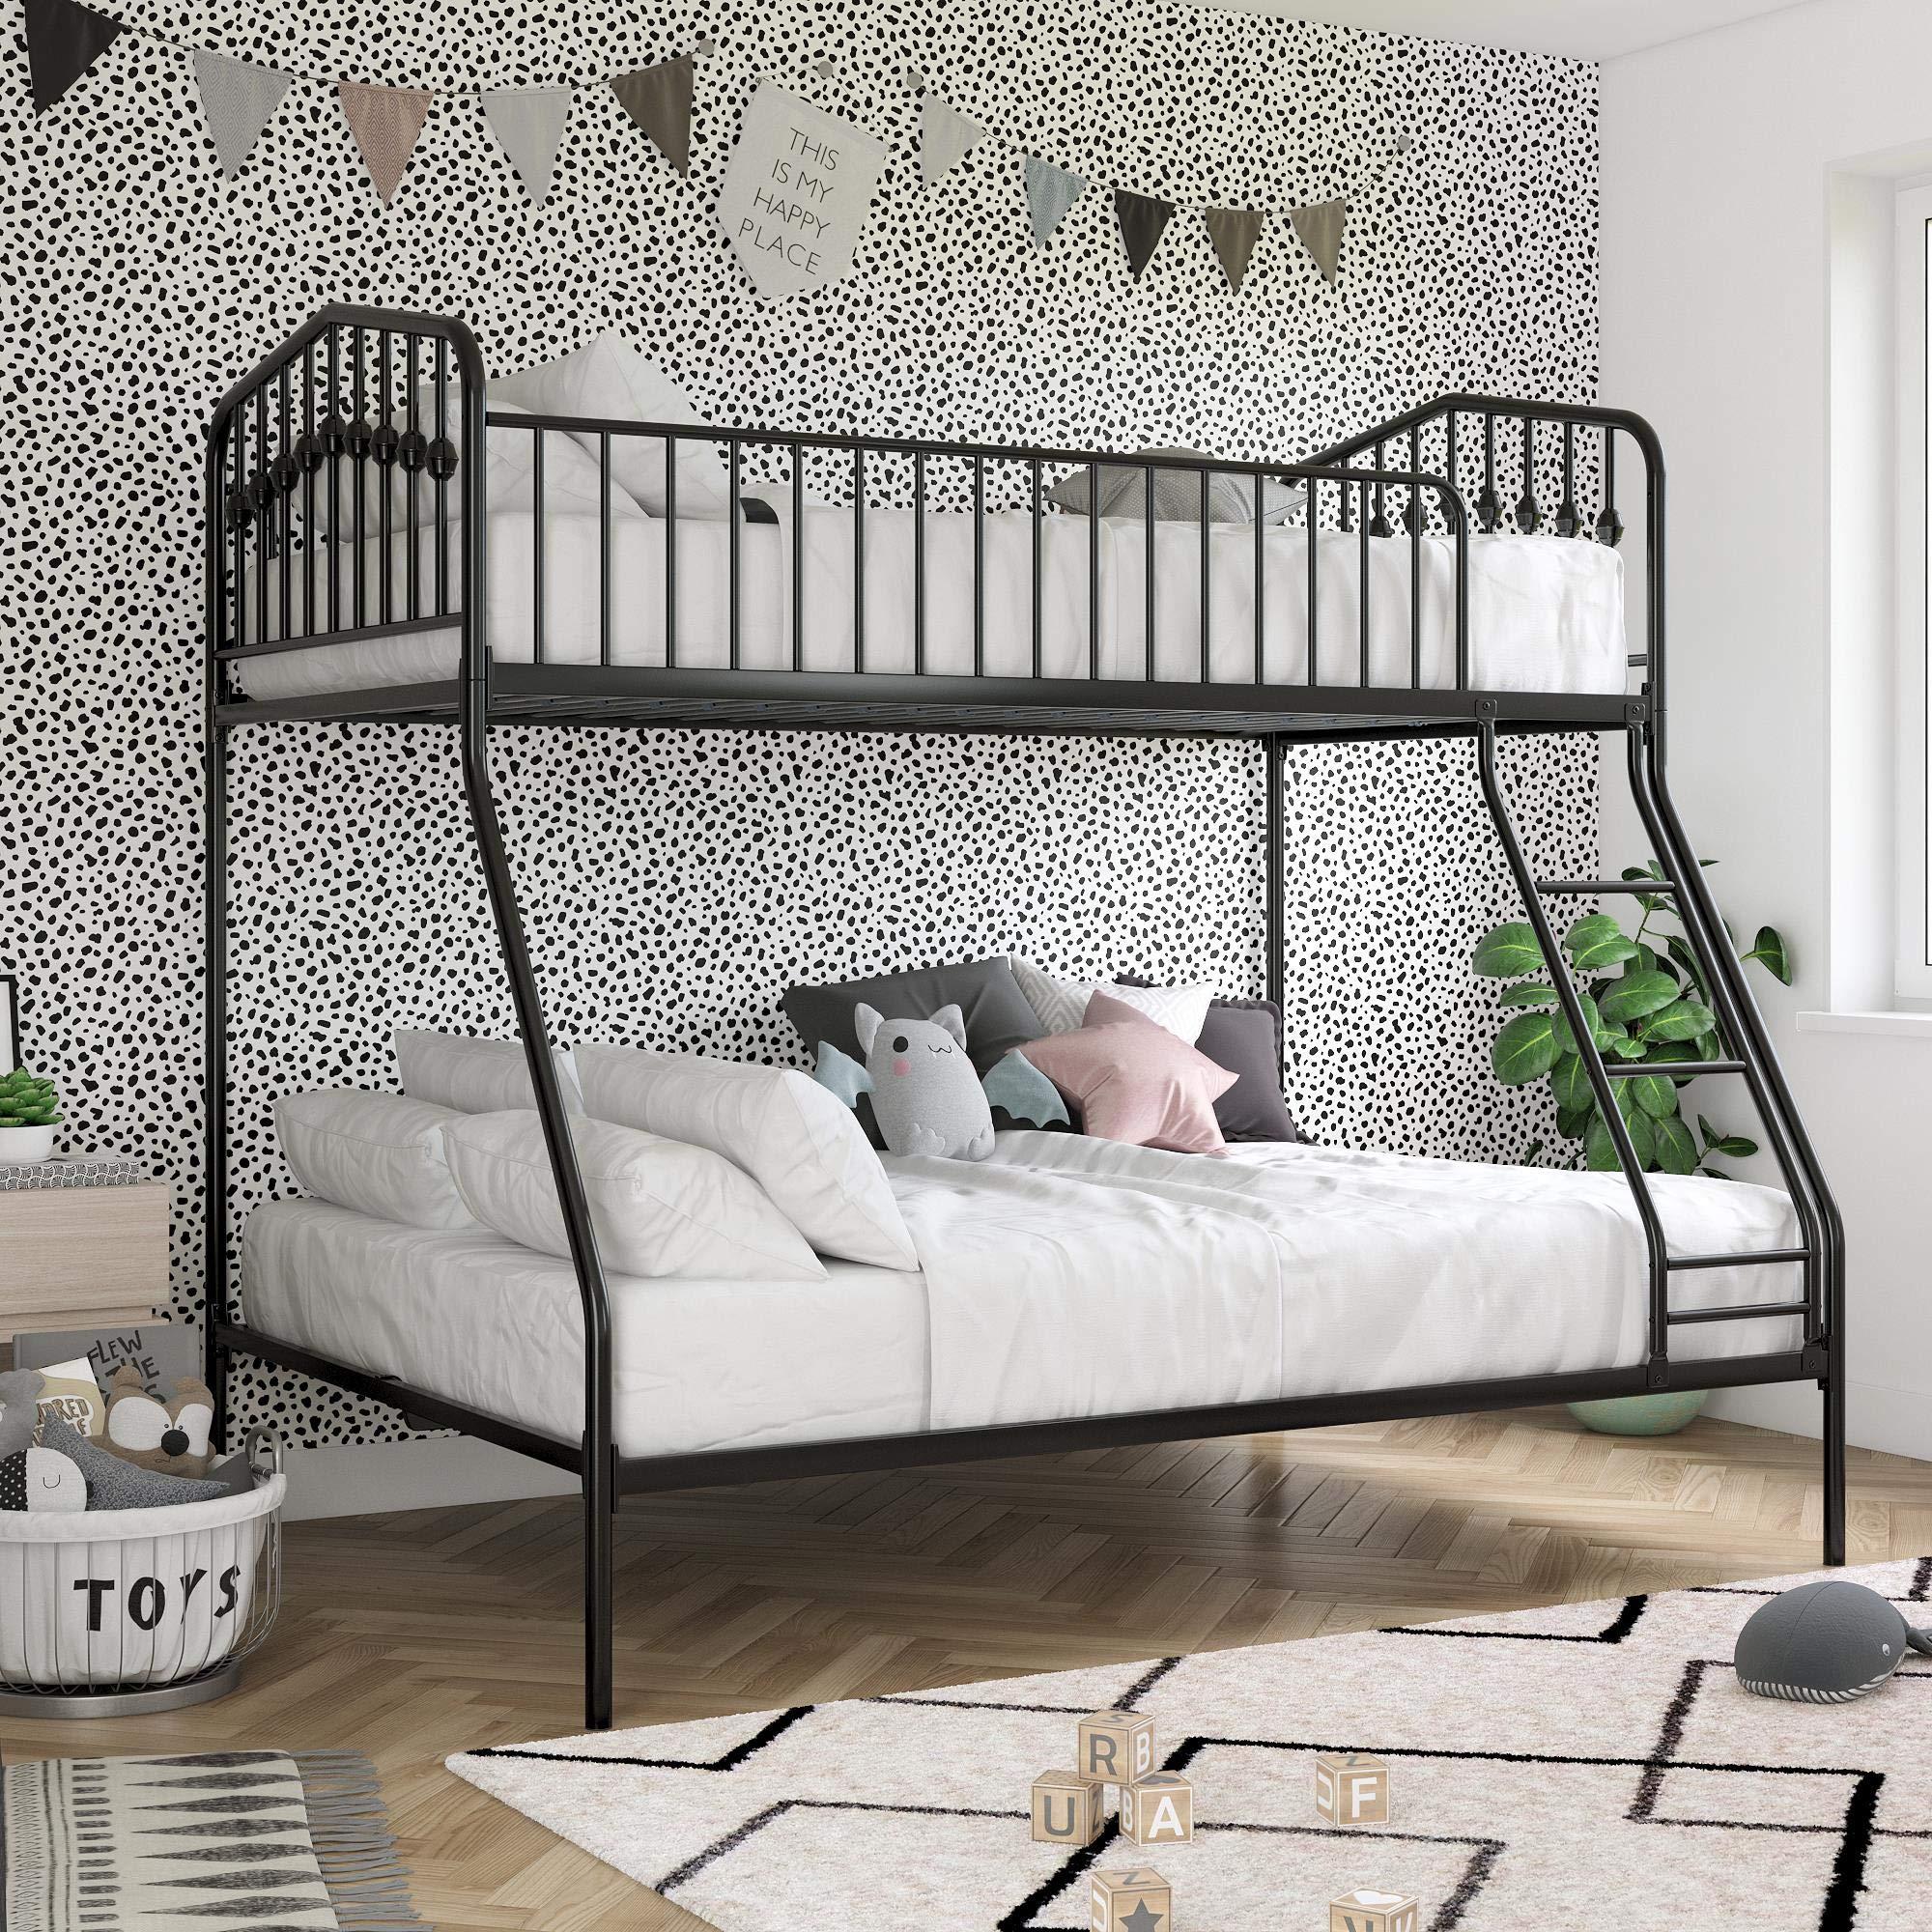 Novogratz Bushwick Metal Bed, Kid's Bedroom Furniture, Twin/Full, Black Bunk